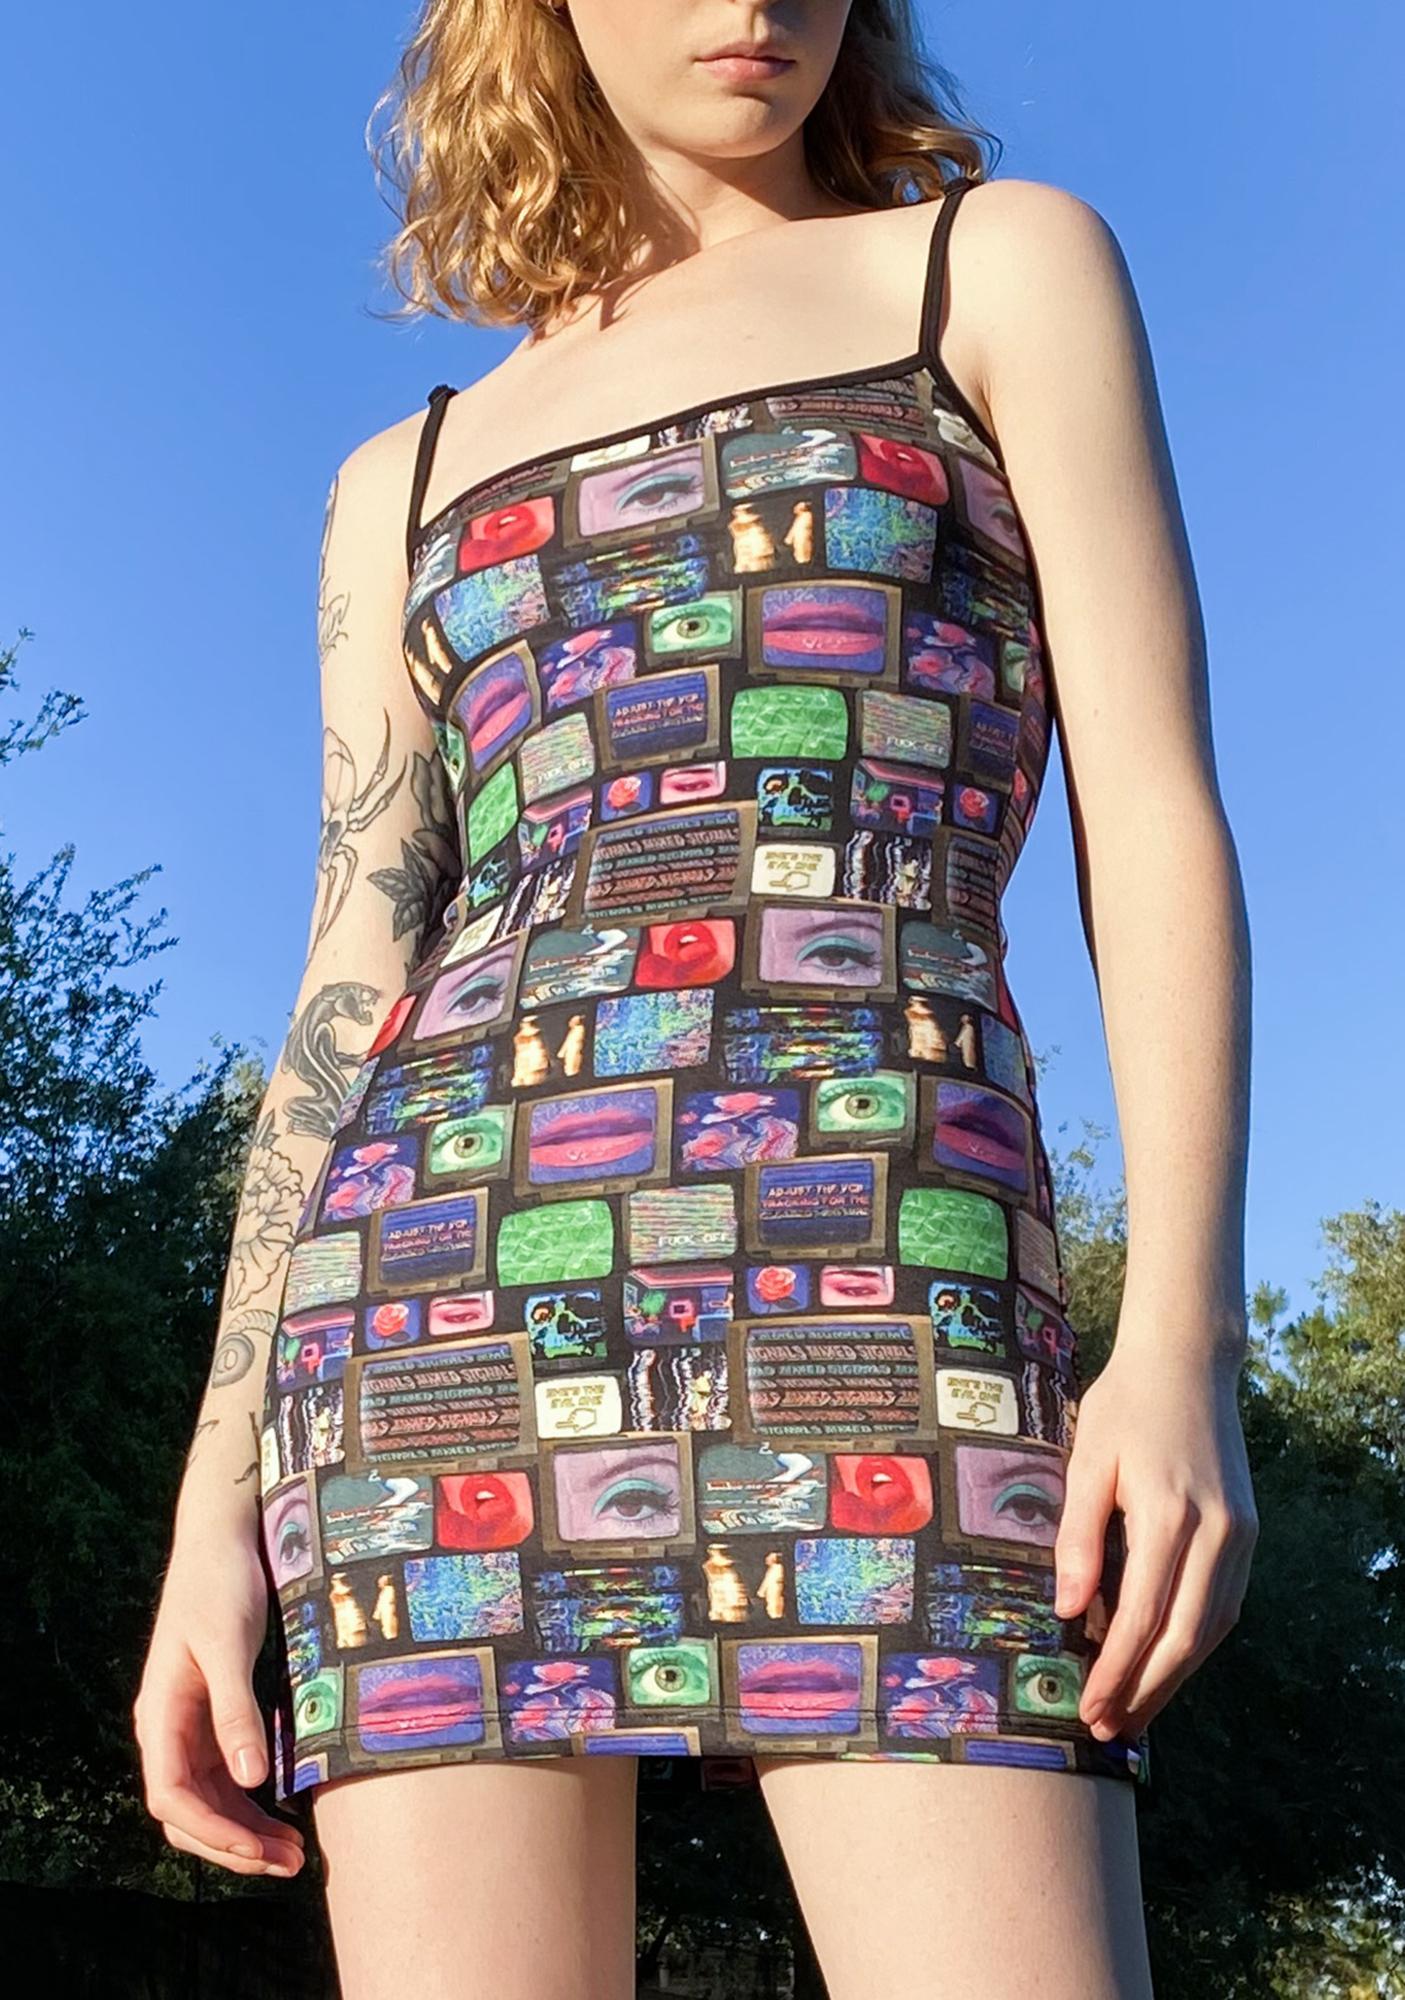 HOROSCOPEZ Technical Difficulties Mini Dress